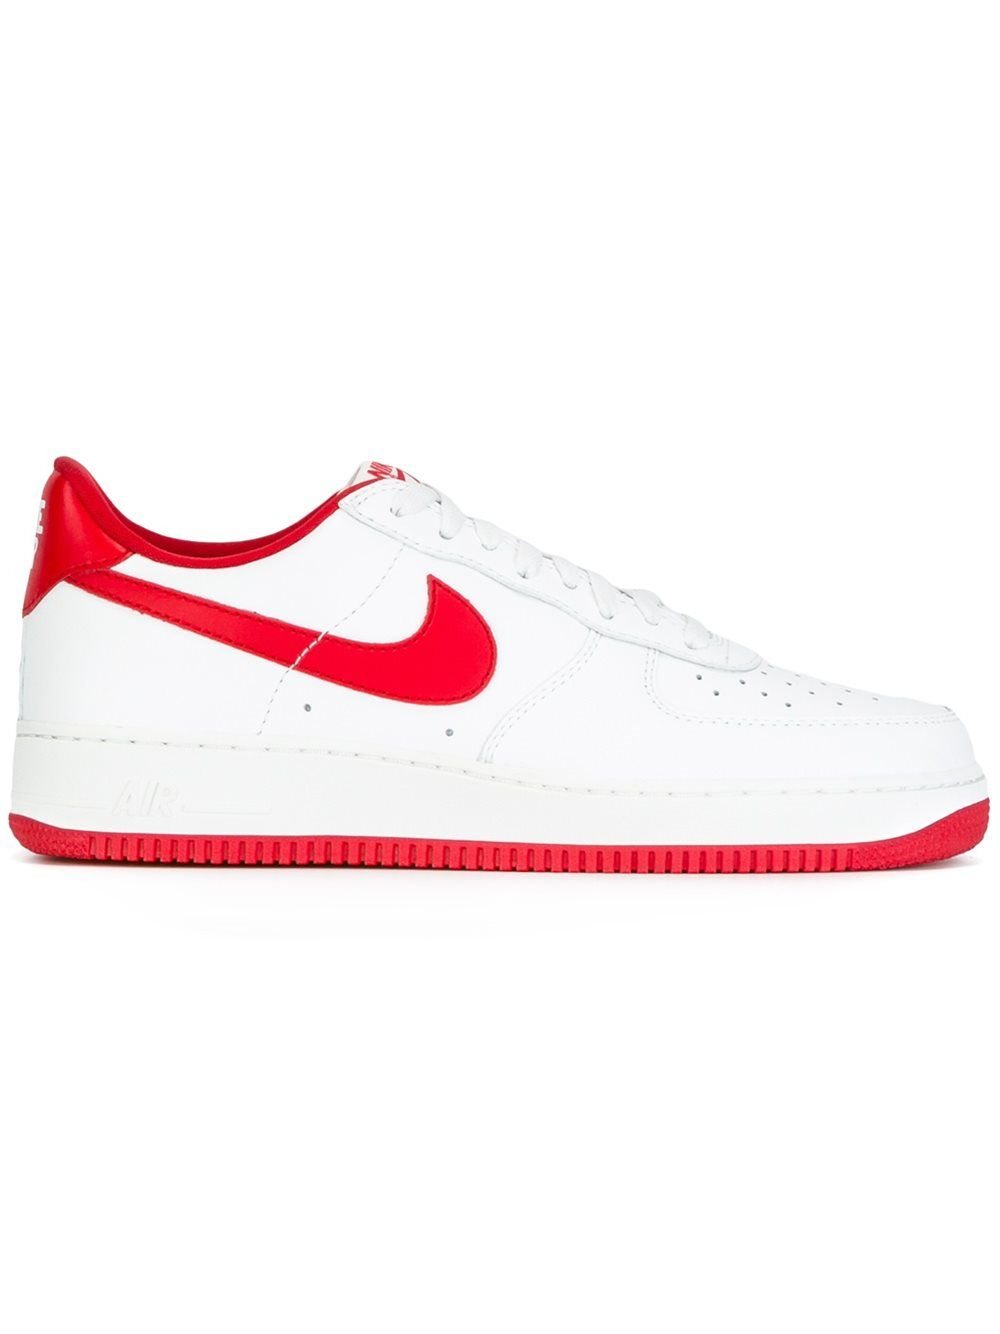 NIKE AIR FORCE 1 LOW RETRO Sneakers White Men